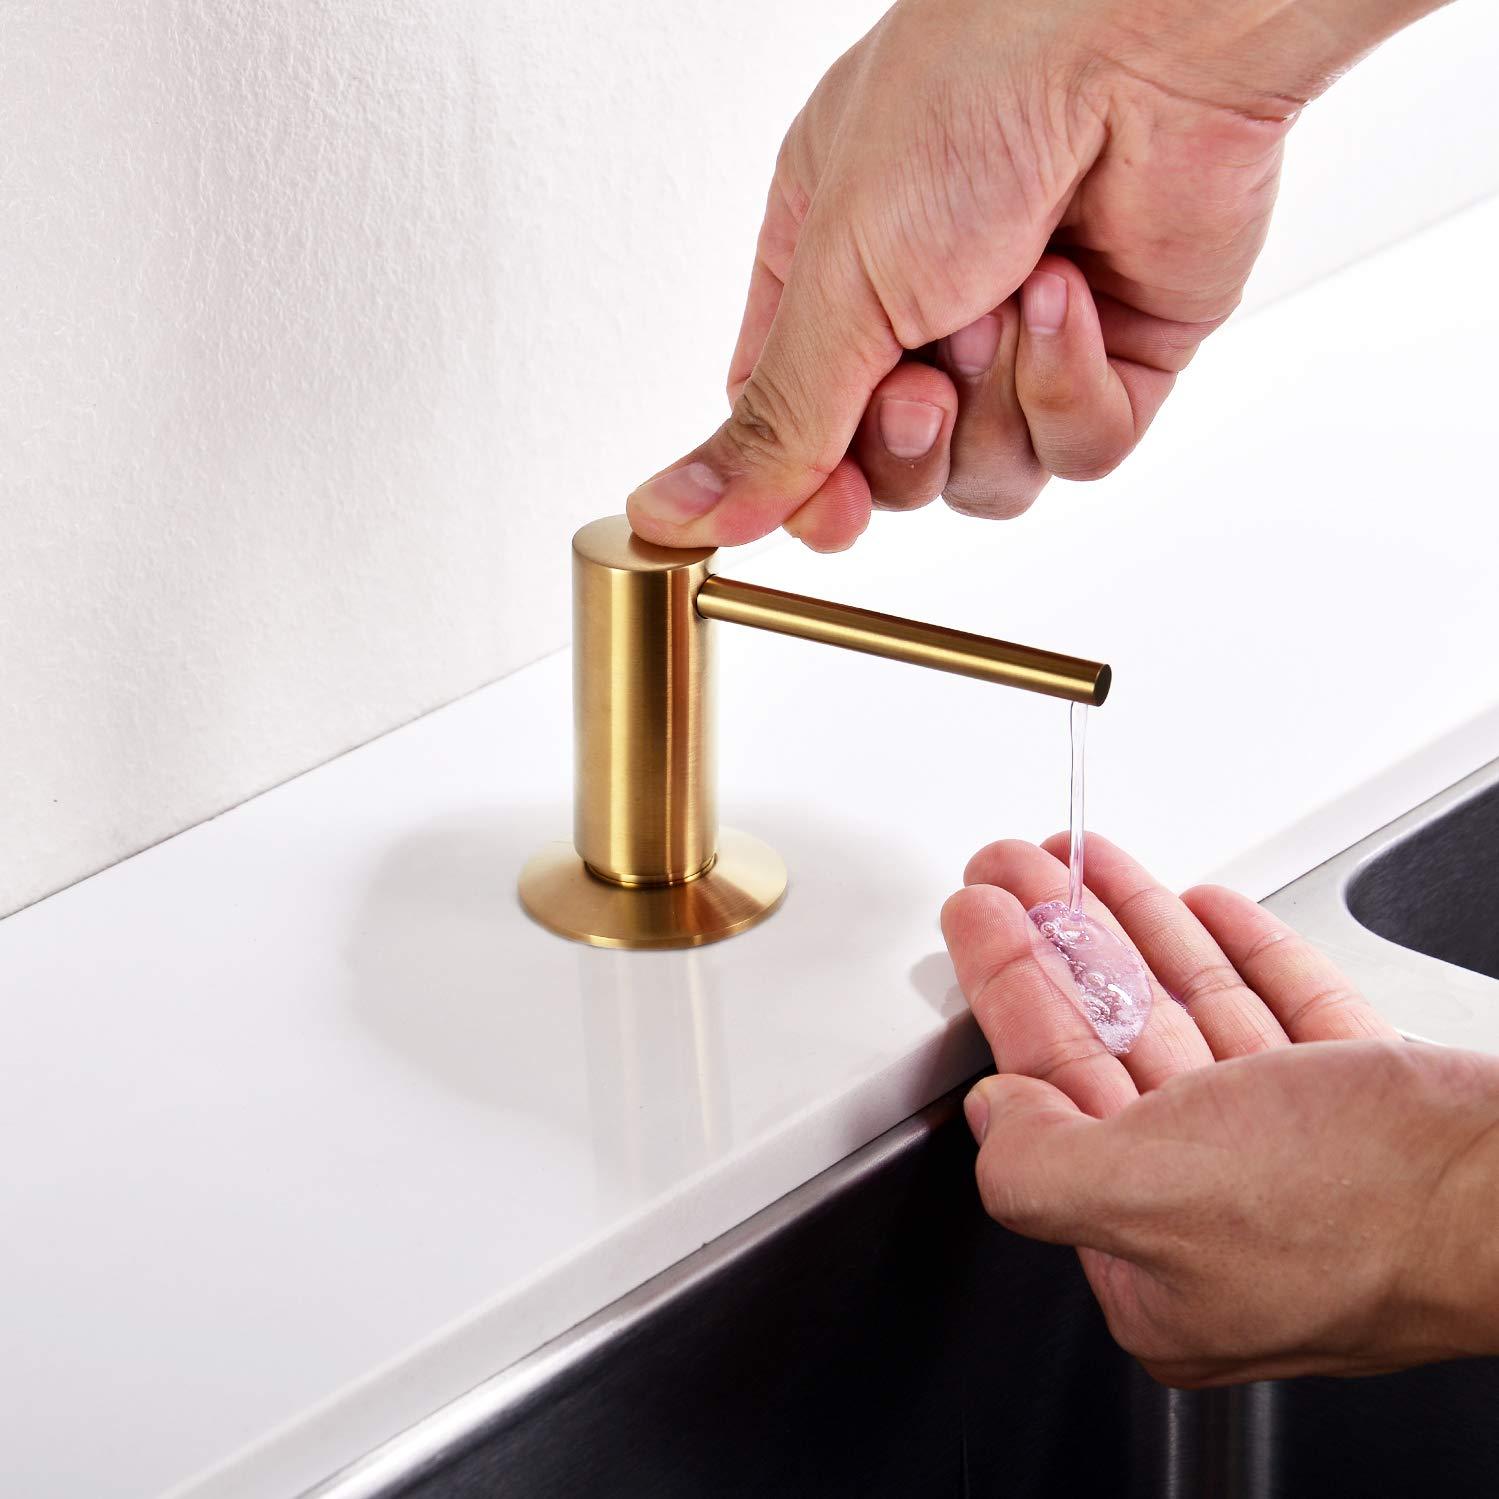 Amazon.com: Avola - Dispensador de jabón para fregadero de ...